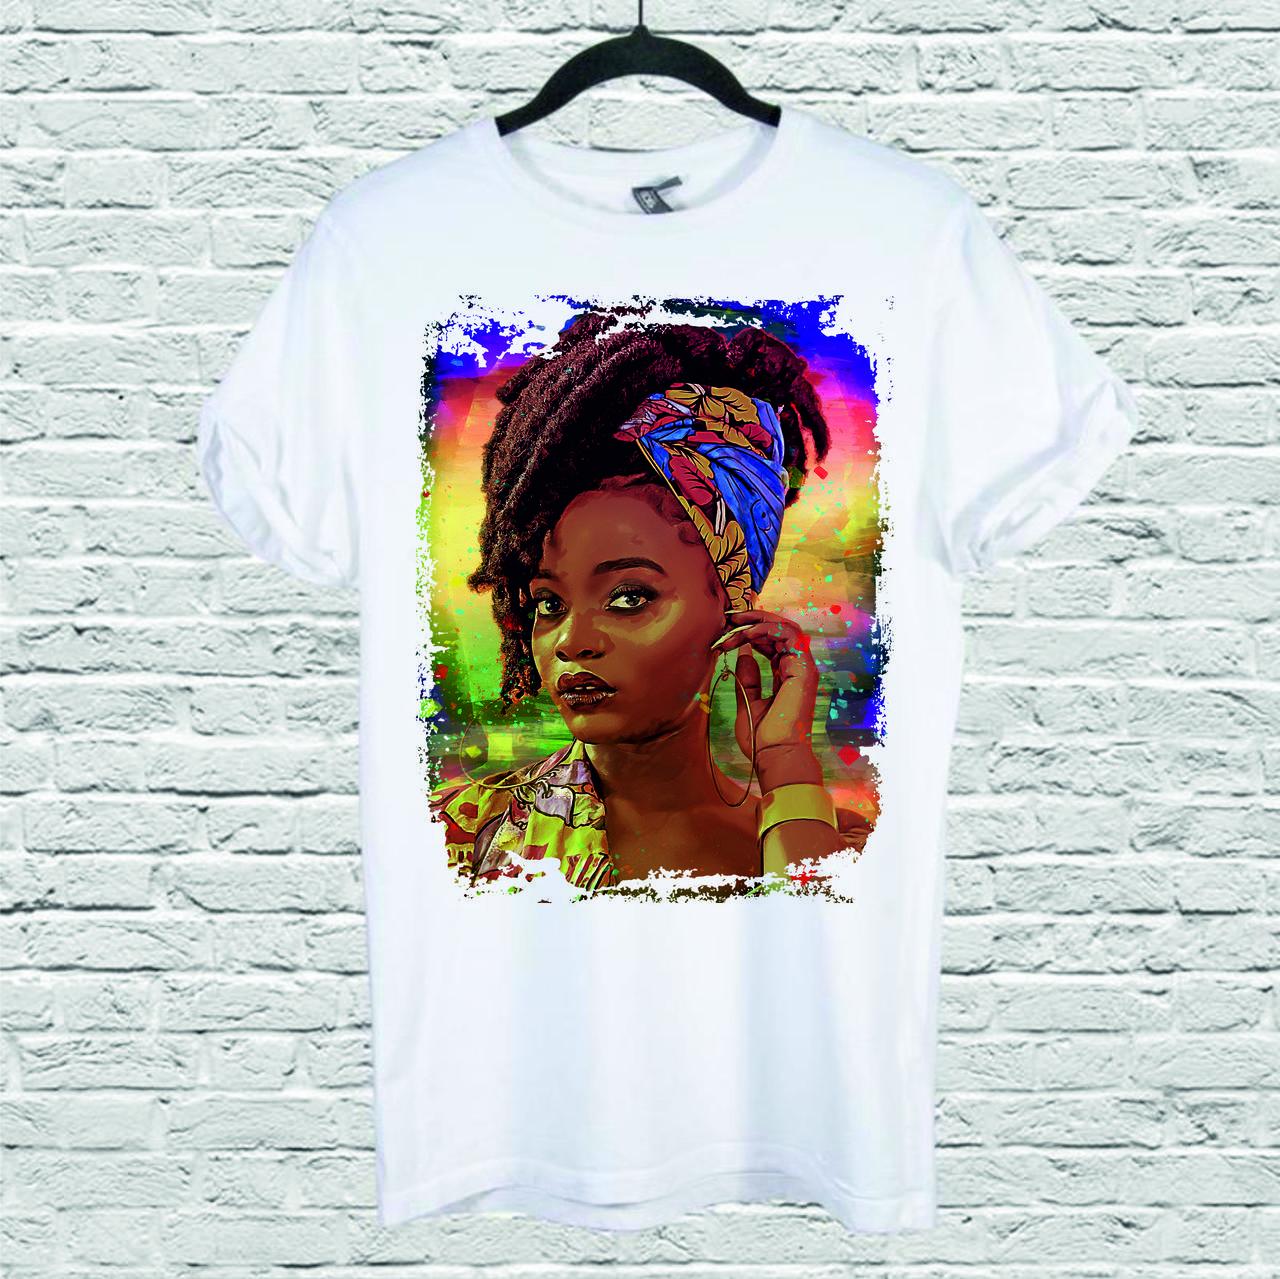 Футболка YOUstyle African girl 0111 M White